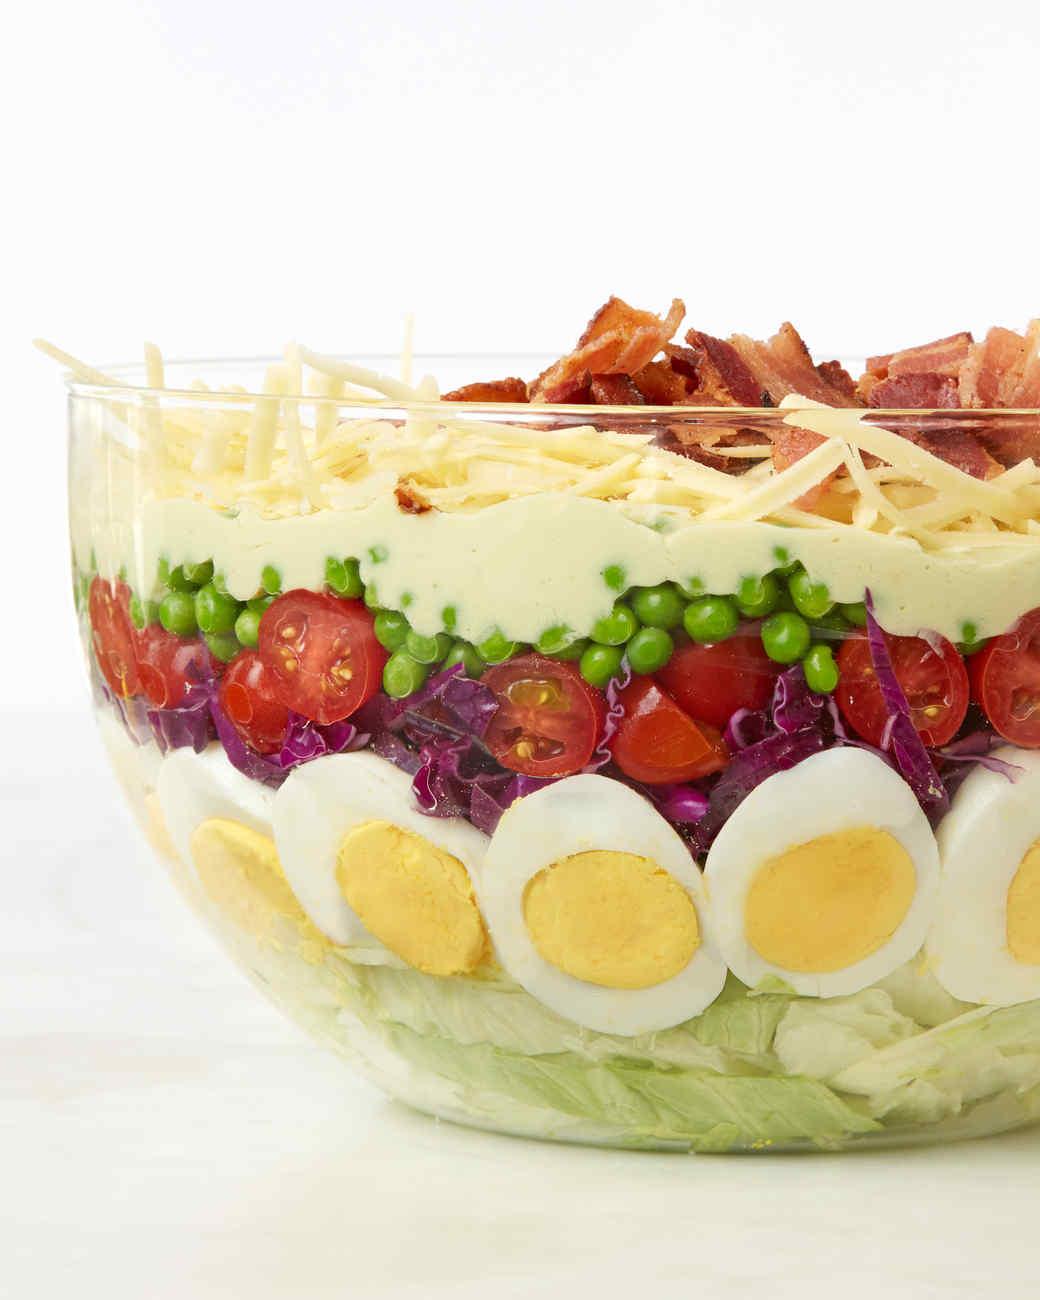 seven-layer-salad-8230-d112977.jpg